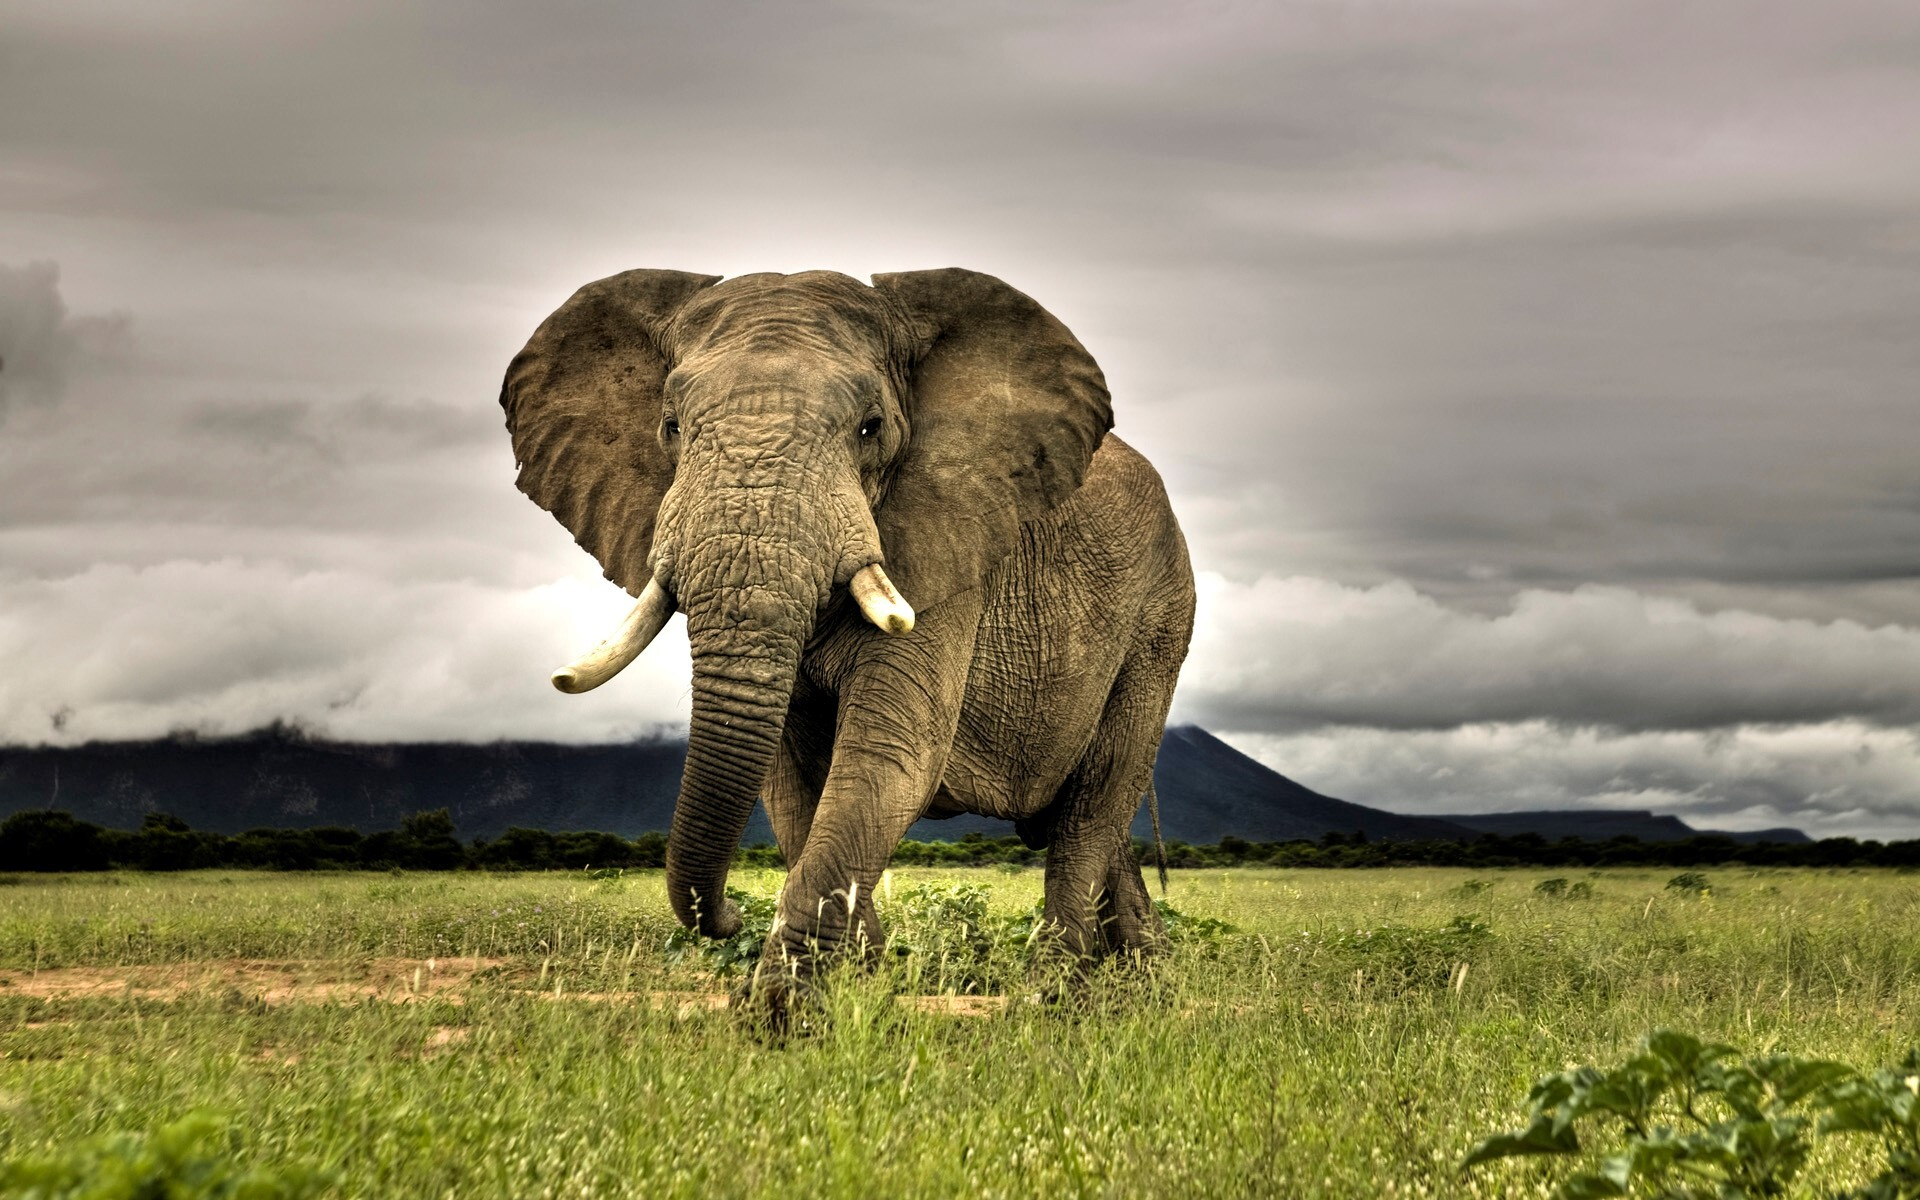 Wallpaper download elephant - Elephant Wallpapers